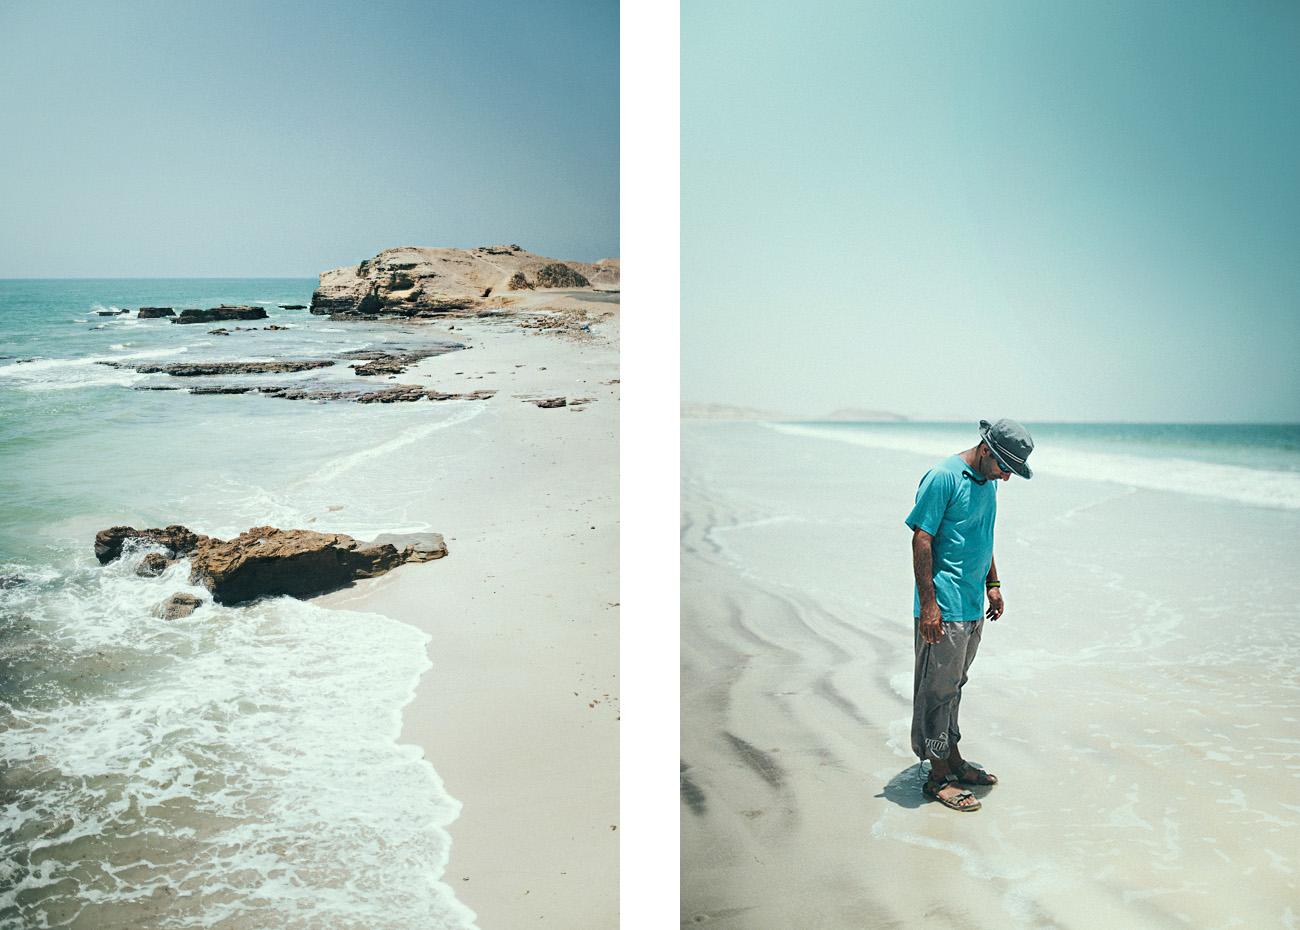 Al Khaluf, Oman